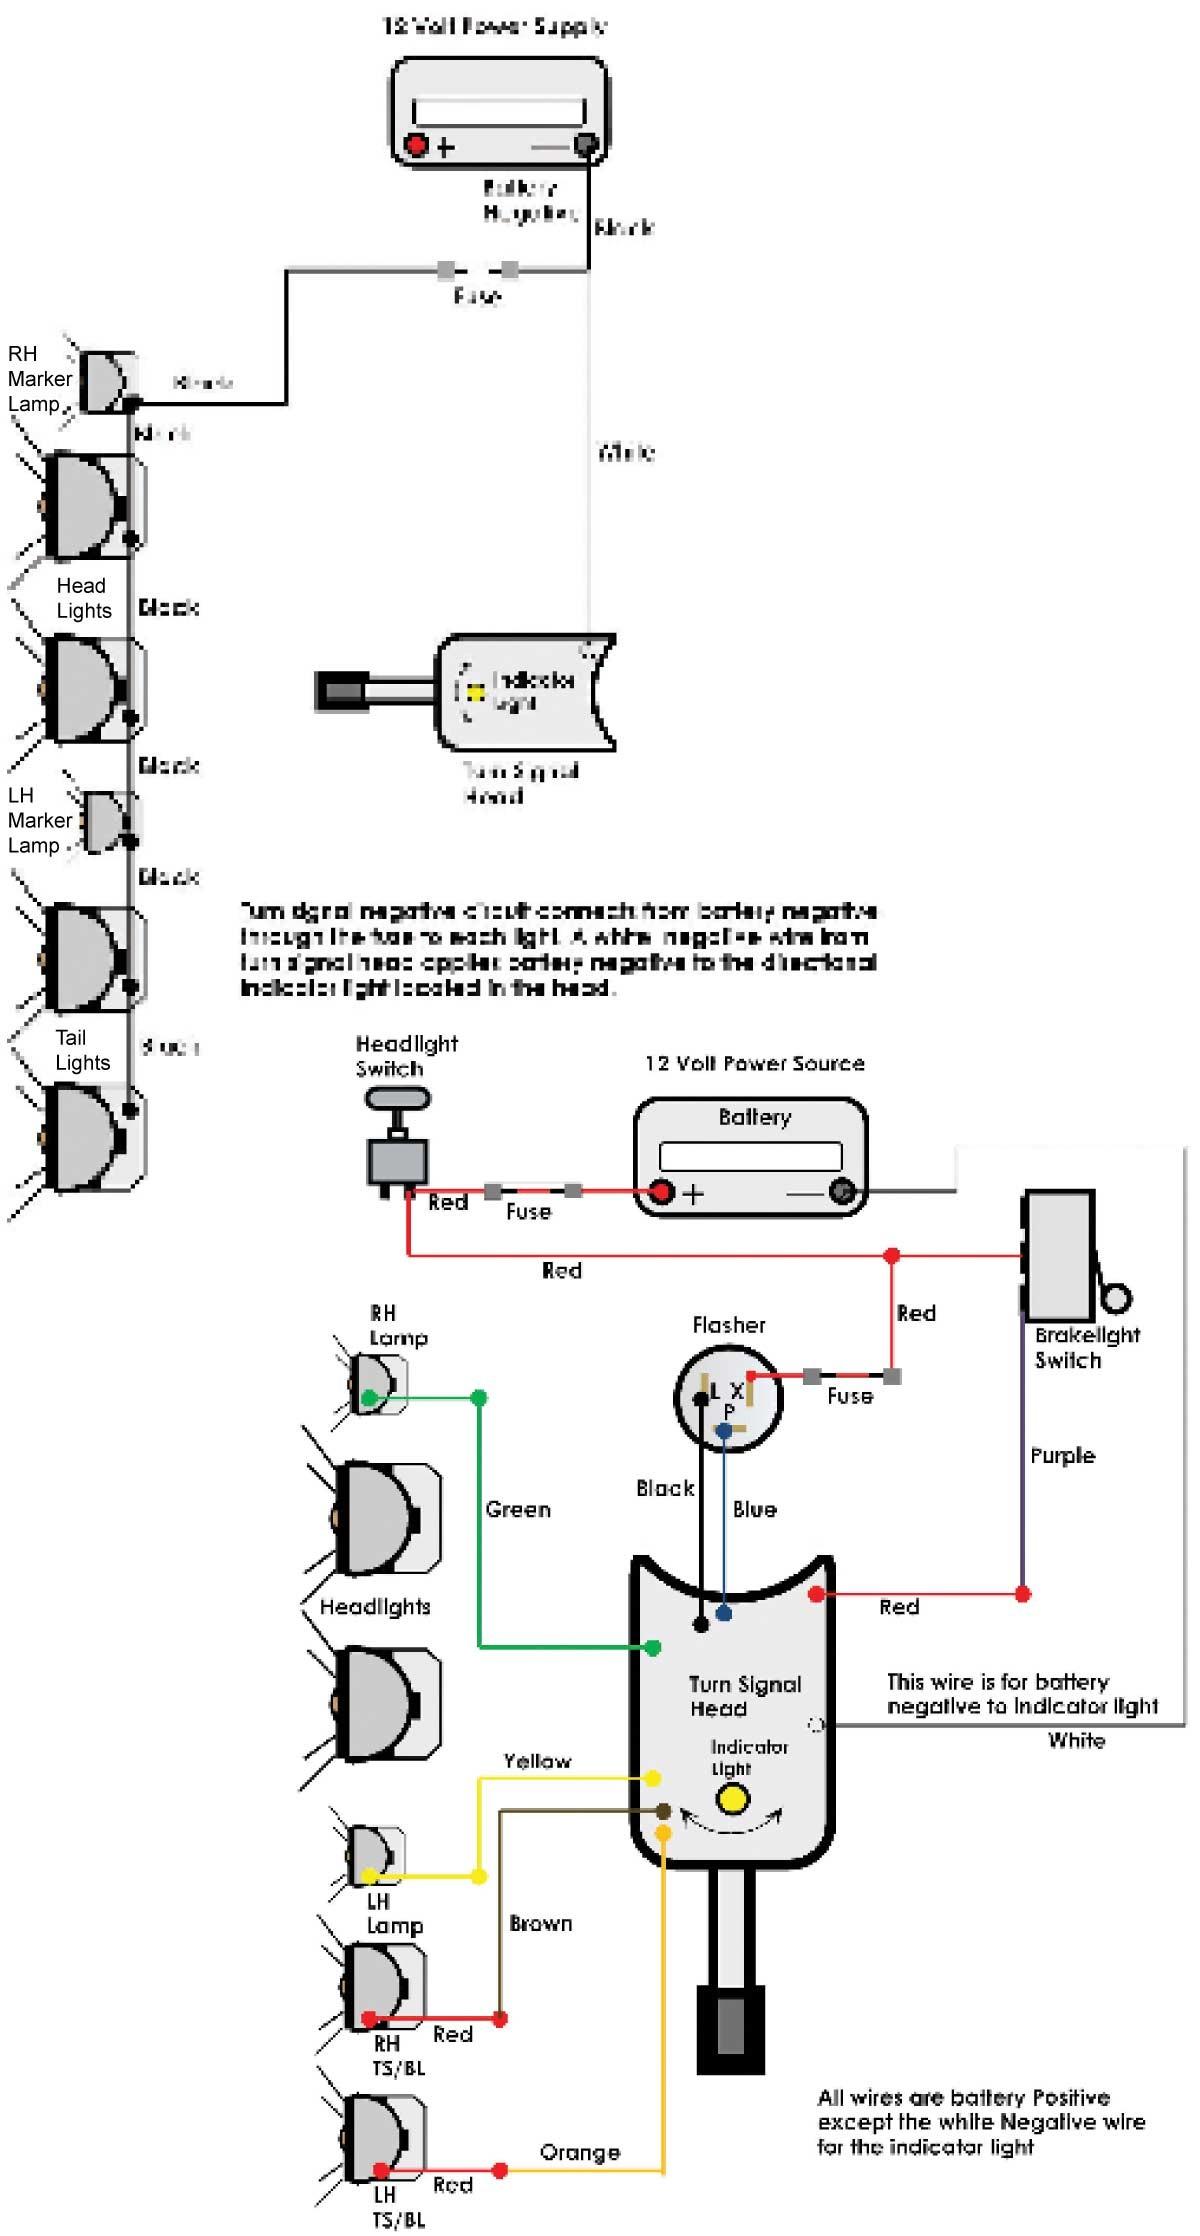 golf cart signal light wiring diagram golf cart turn signal wire rh minimuma co Grote Turn Signal Wiring Diagram Turn Signal Circuit Diagram